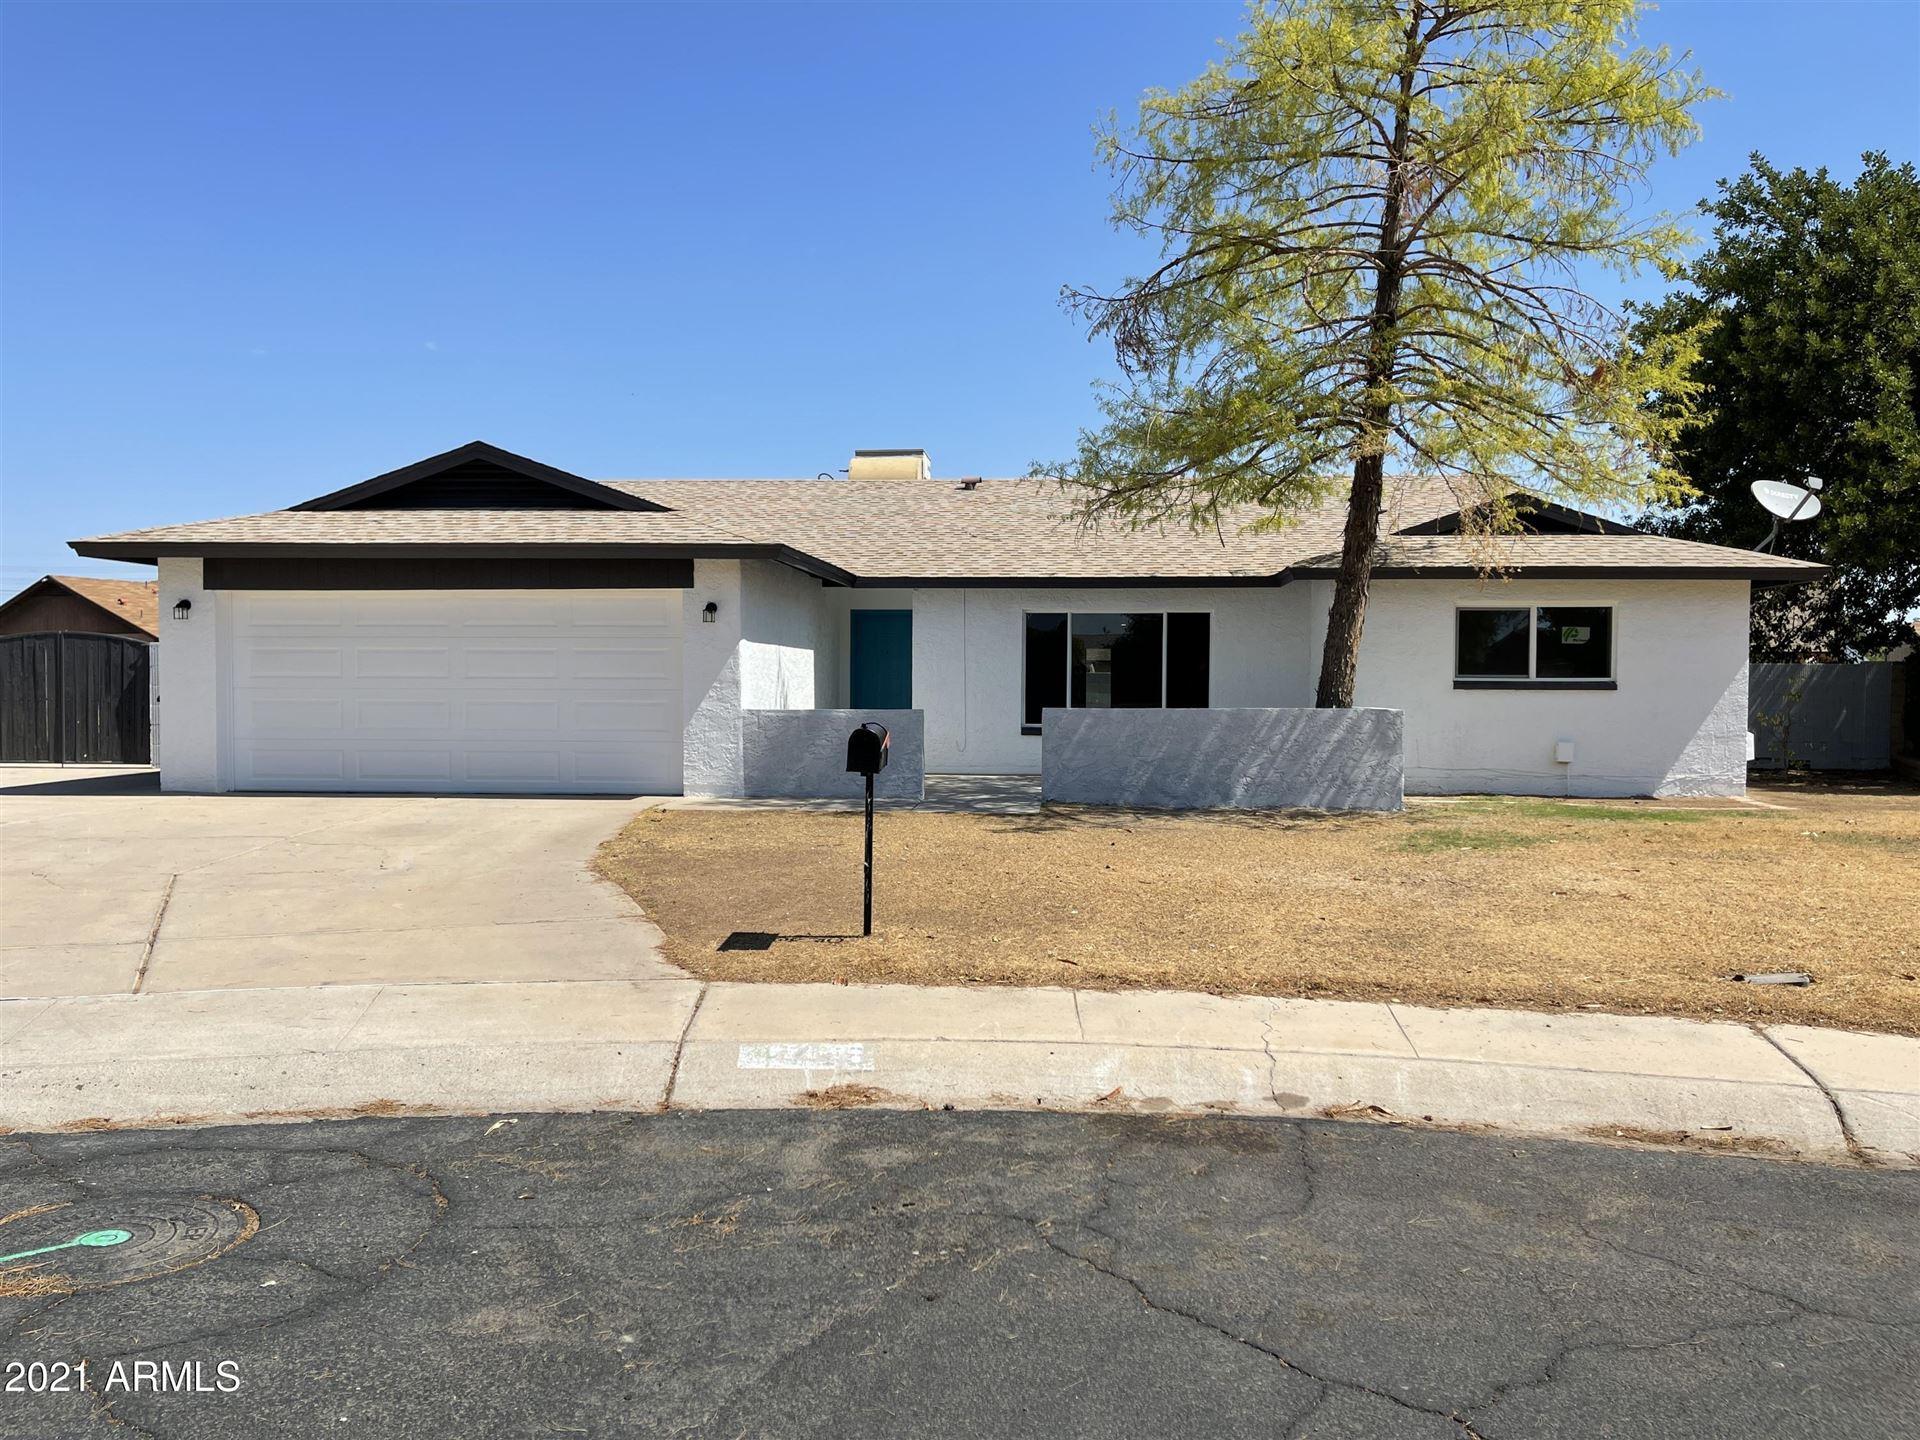 716 W VAUGHN Street, Tempe, AZ 85283 - MLS#: 6251777